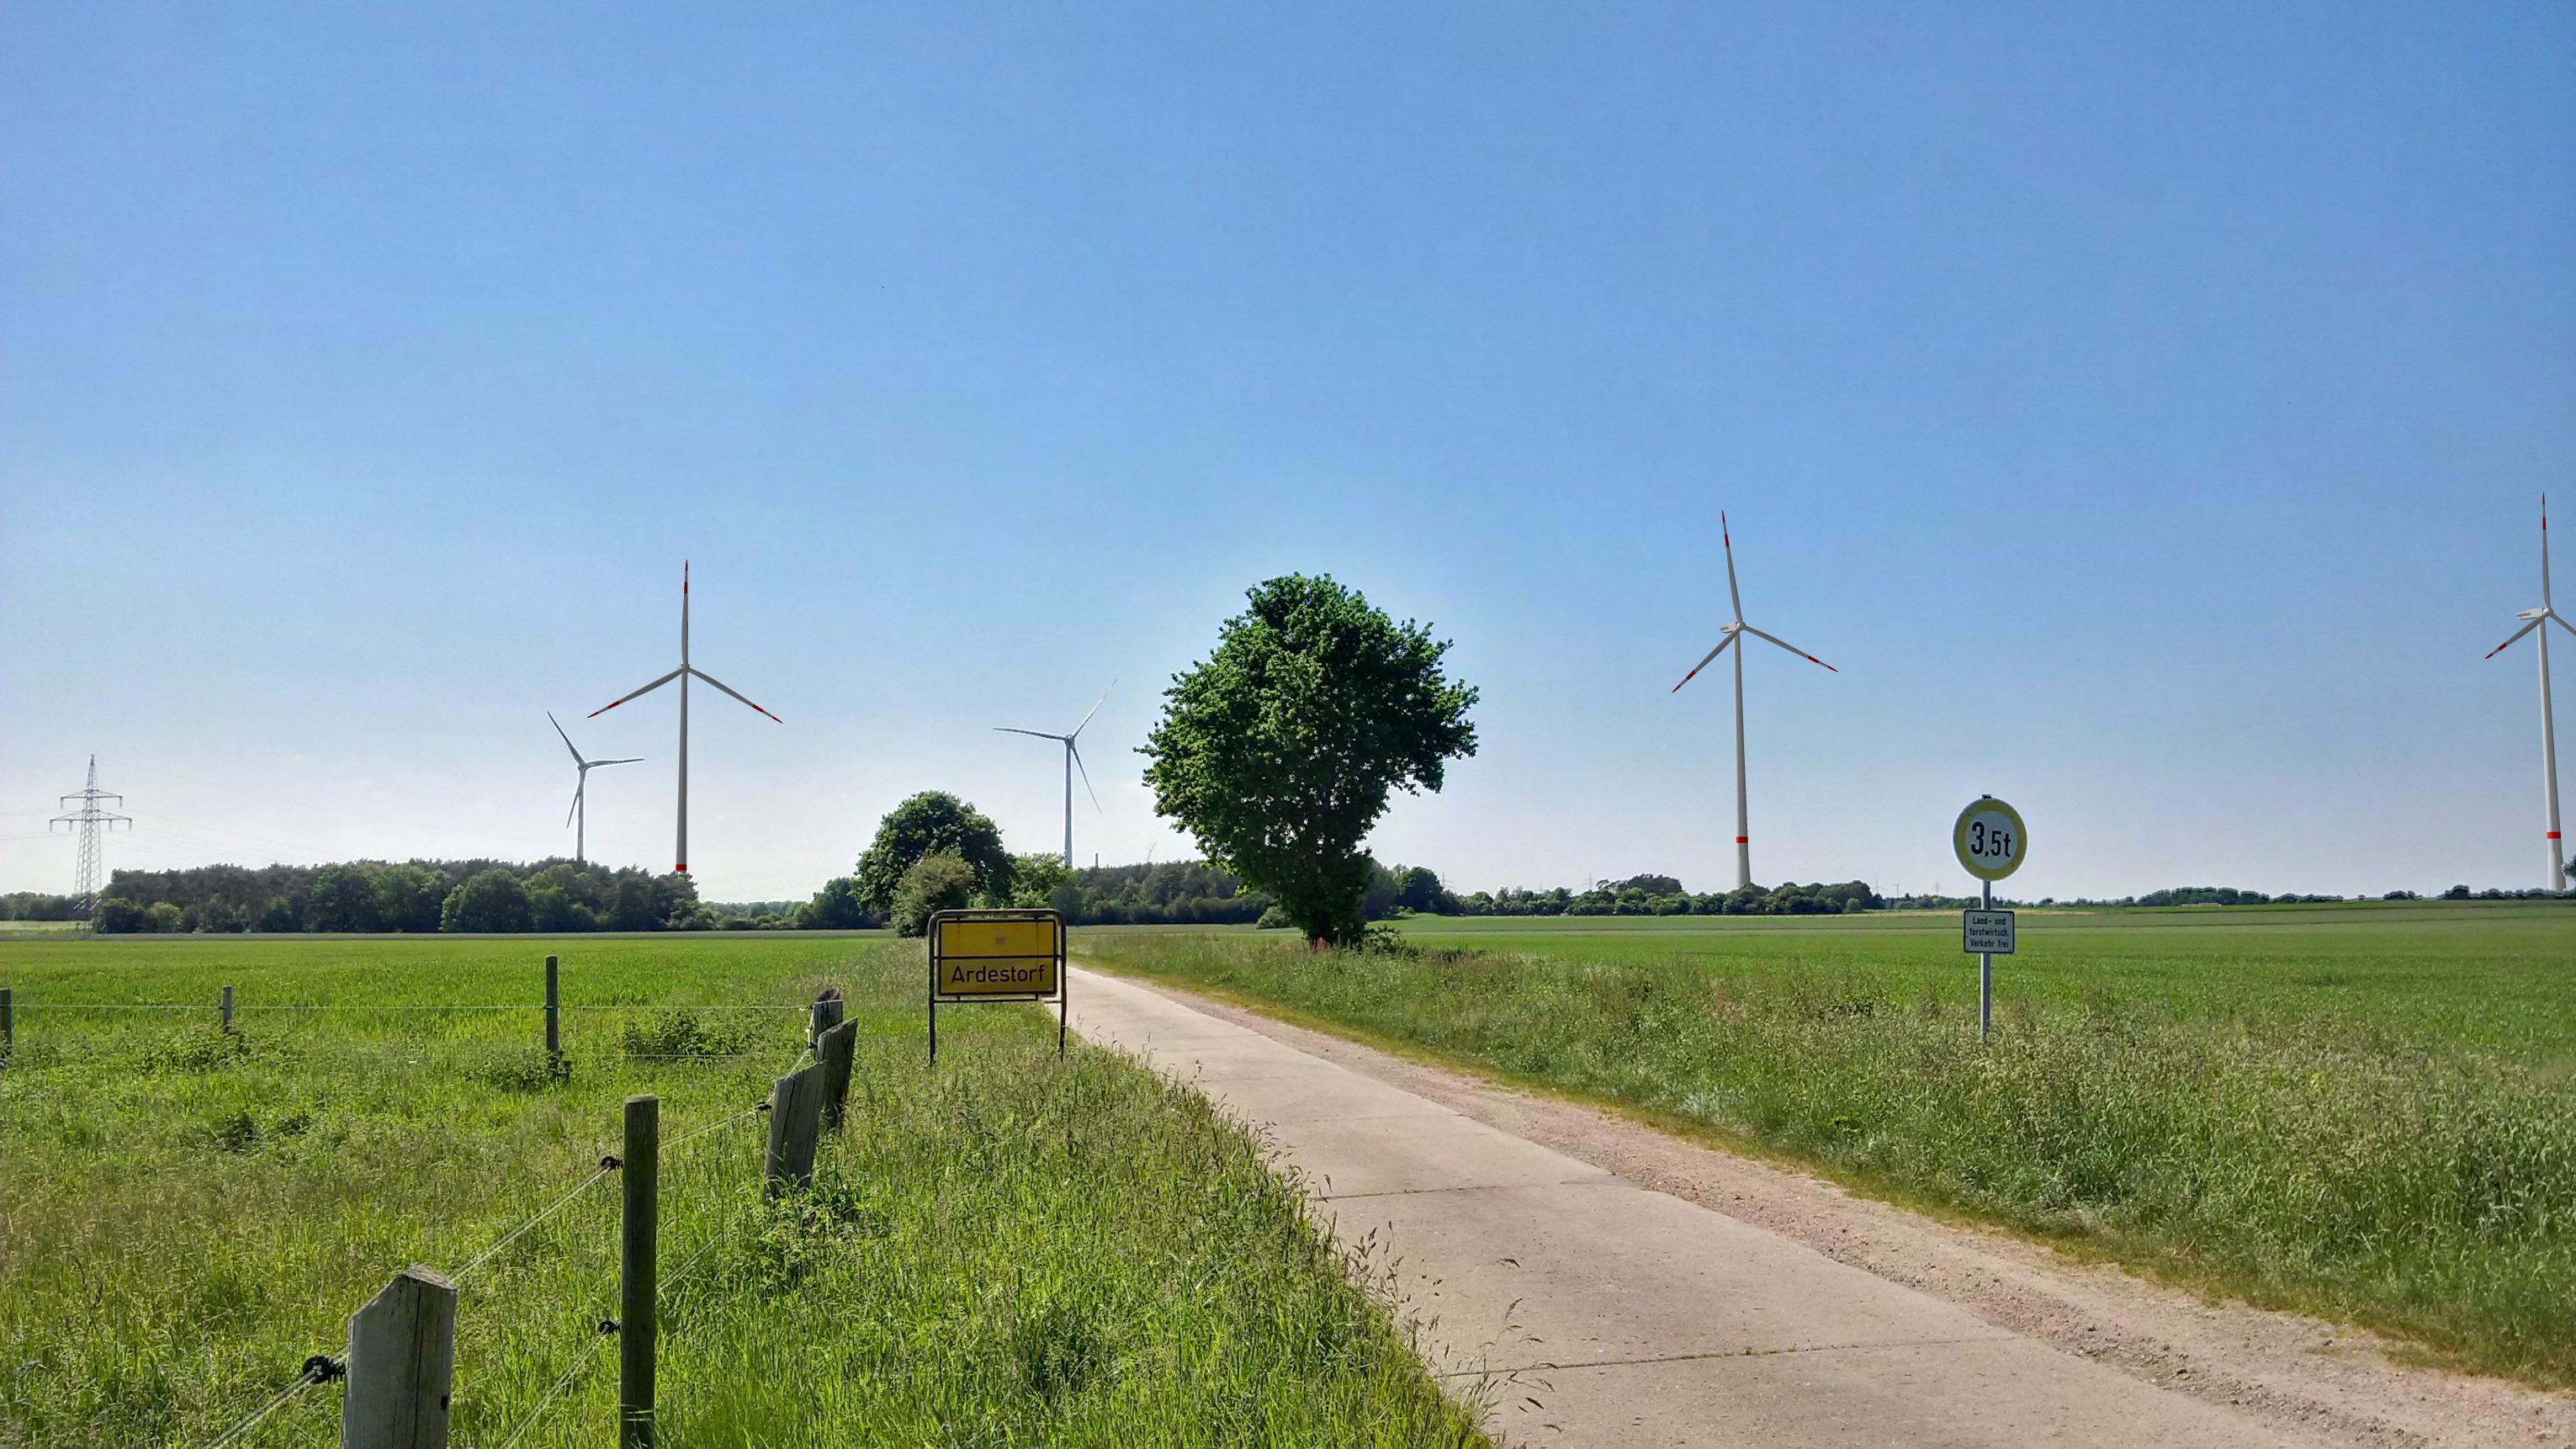 Foto 4 - WEA Immenbeck + 3 x Senvion (Ardestorf)